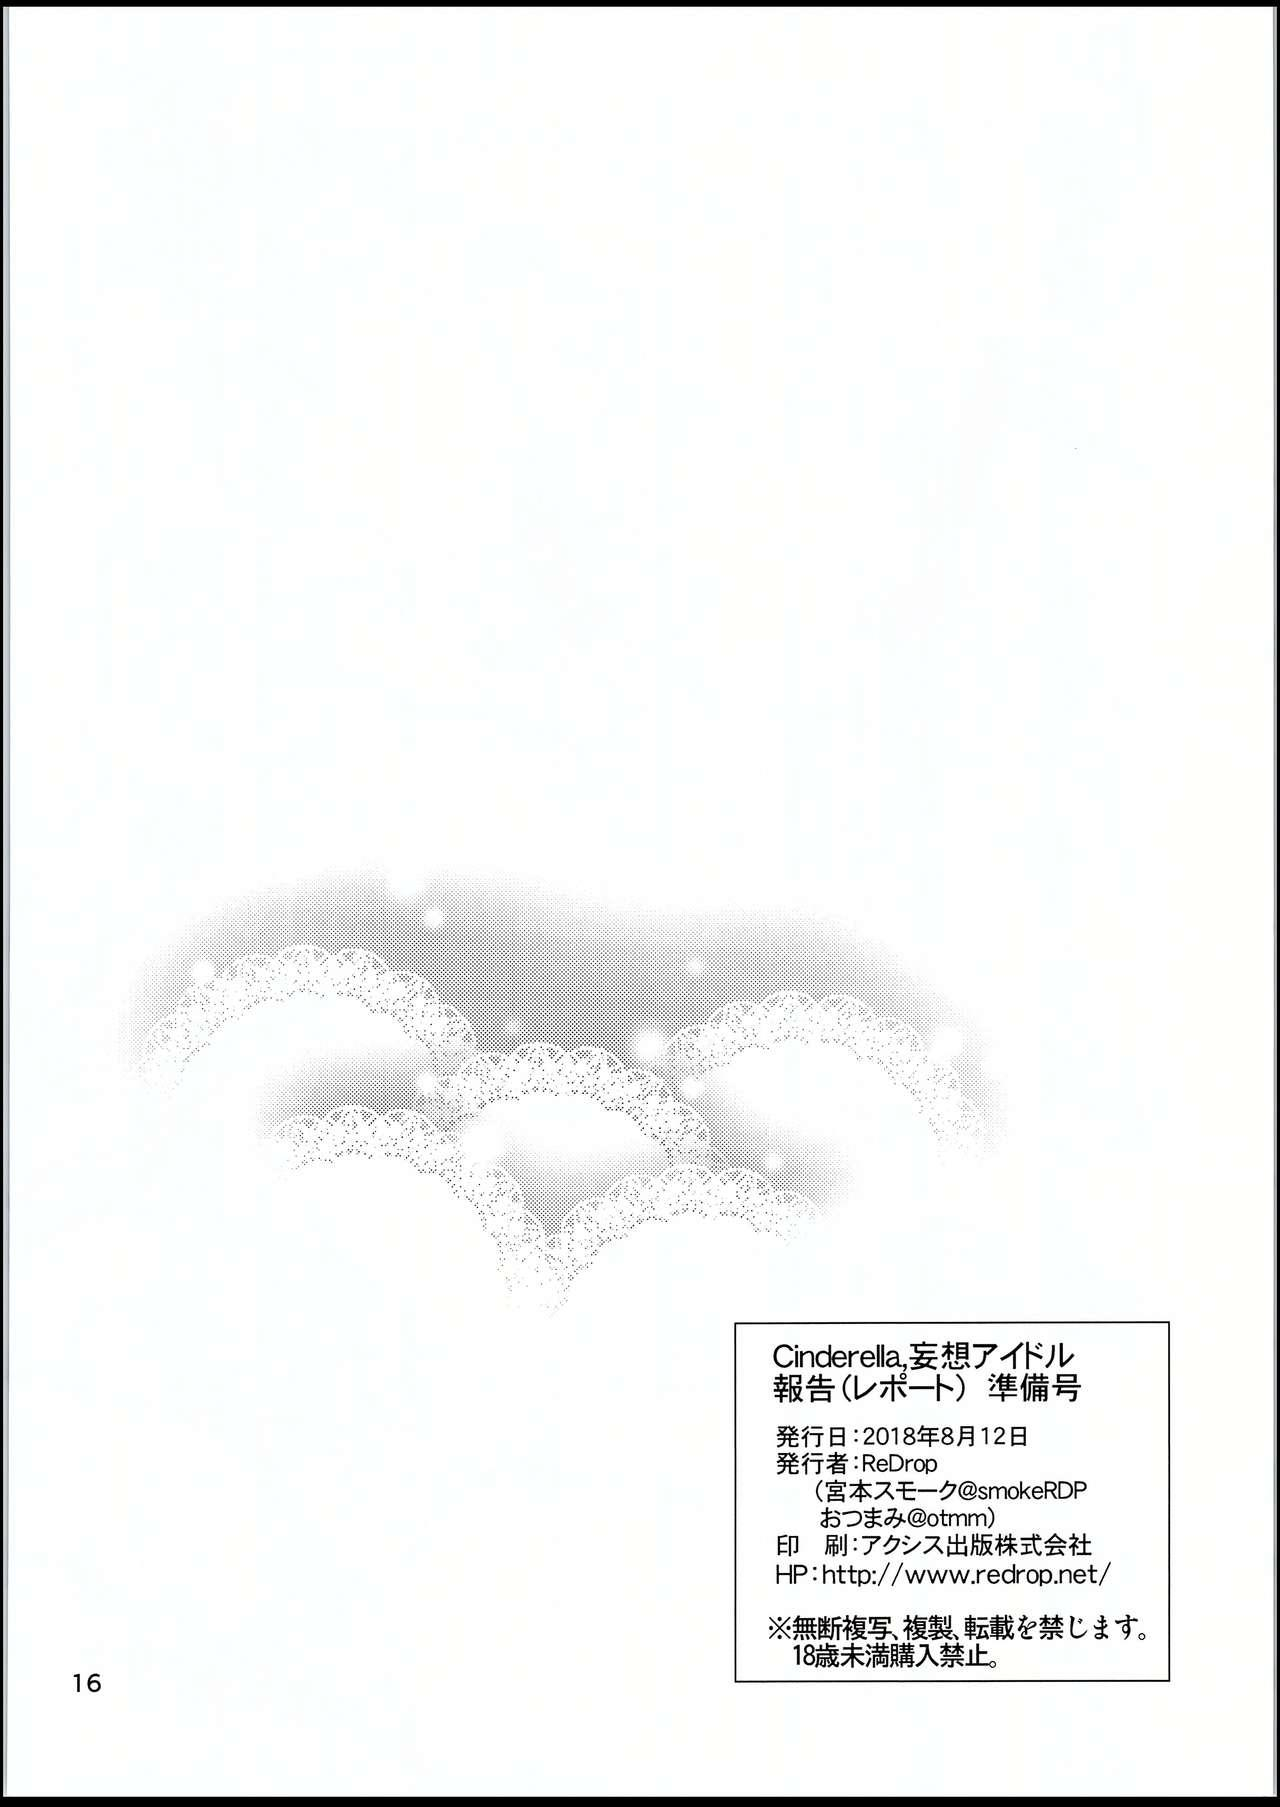 Cinderella, Mousou IDOL Report Junbigou 14